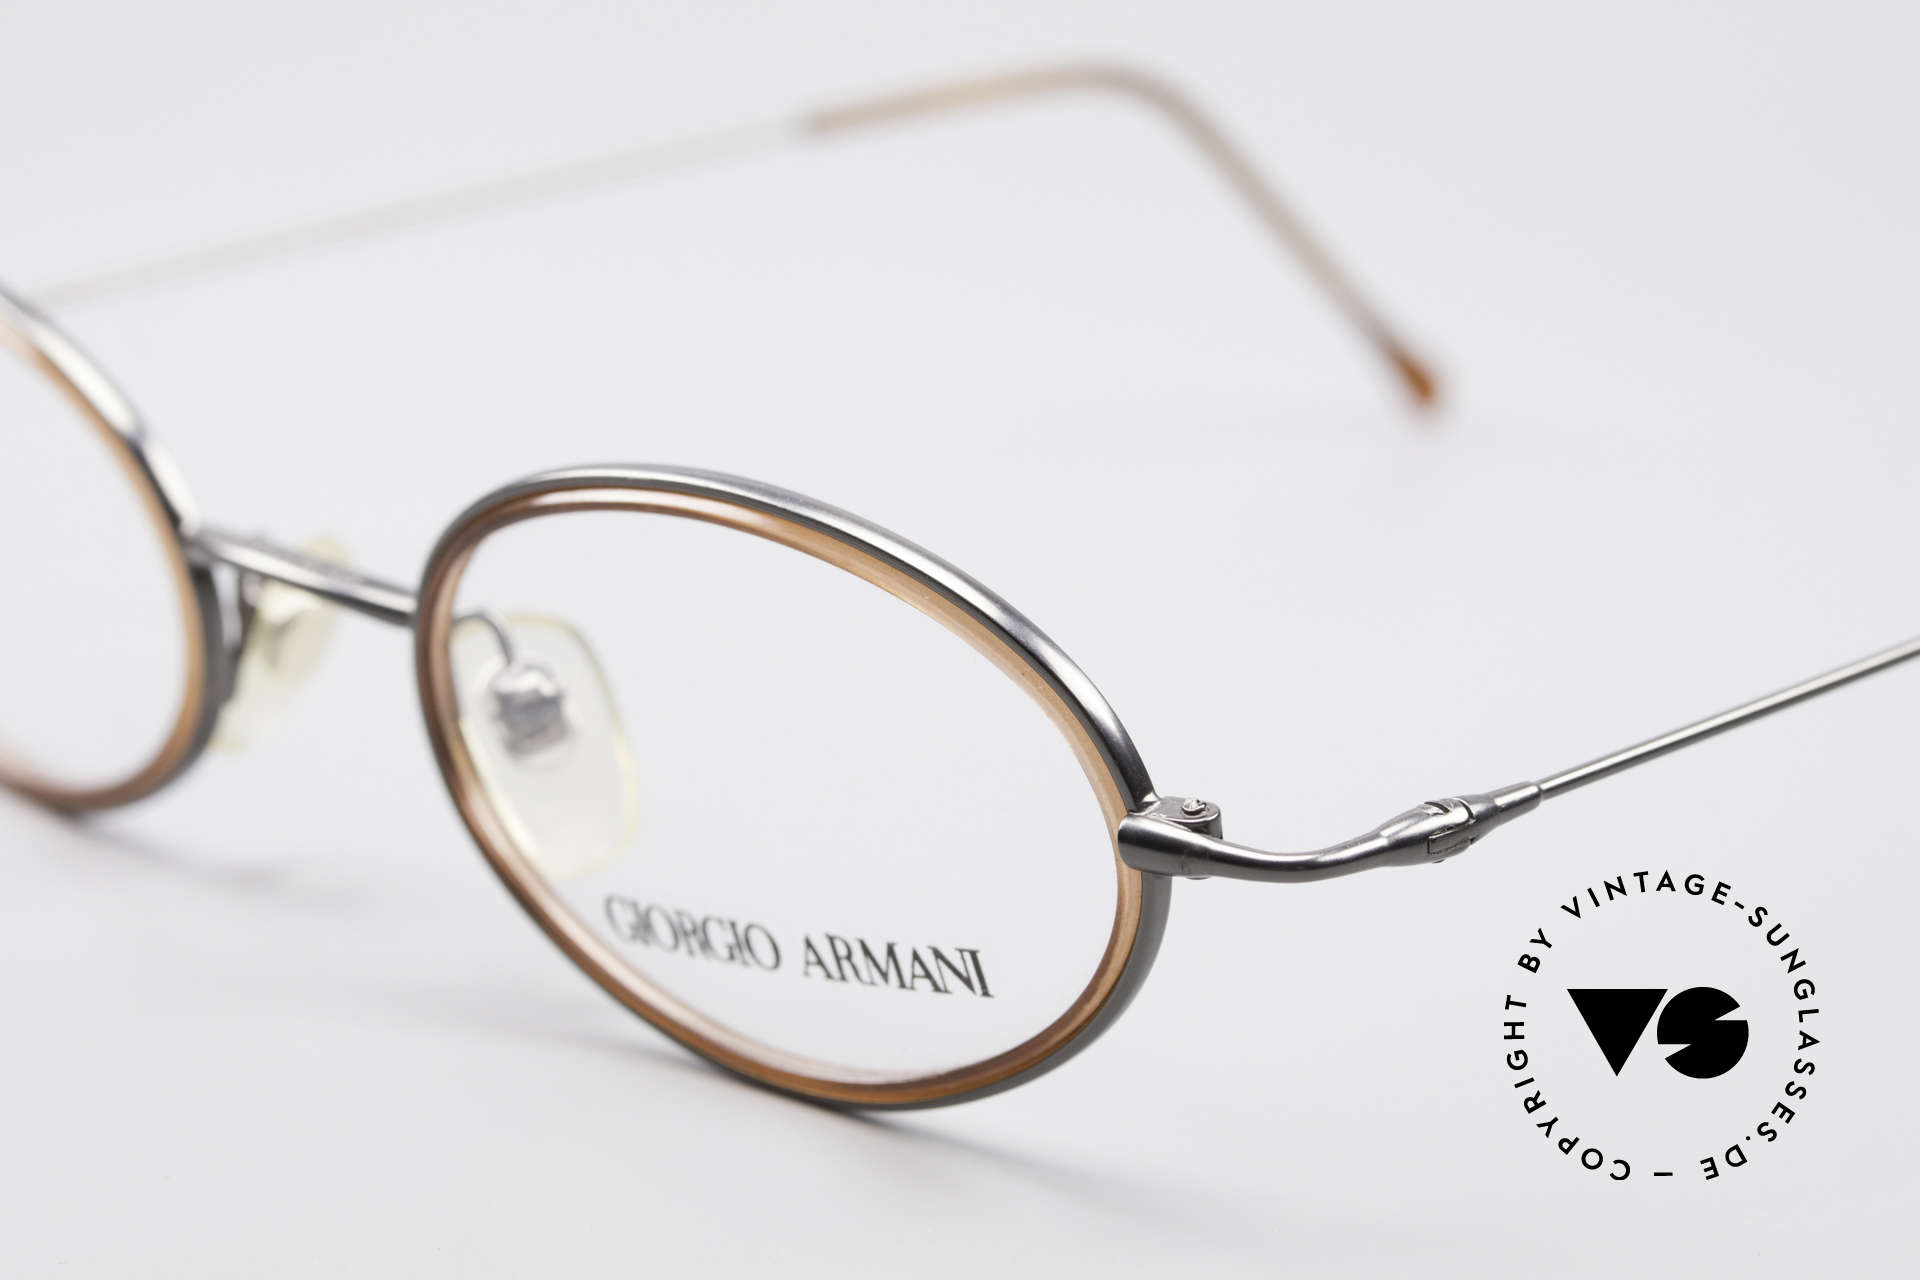 Brillen Giorgio Armani 1012 Ovale Vintage Unisex Brille | Vintage ...